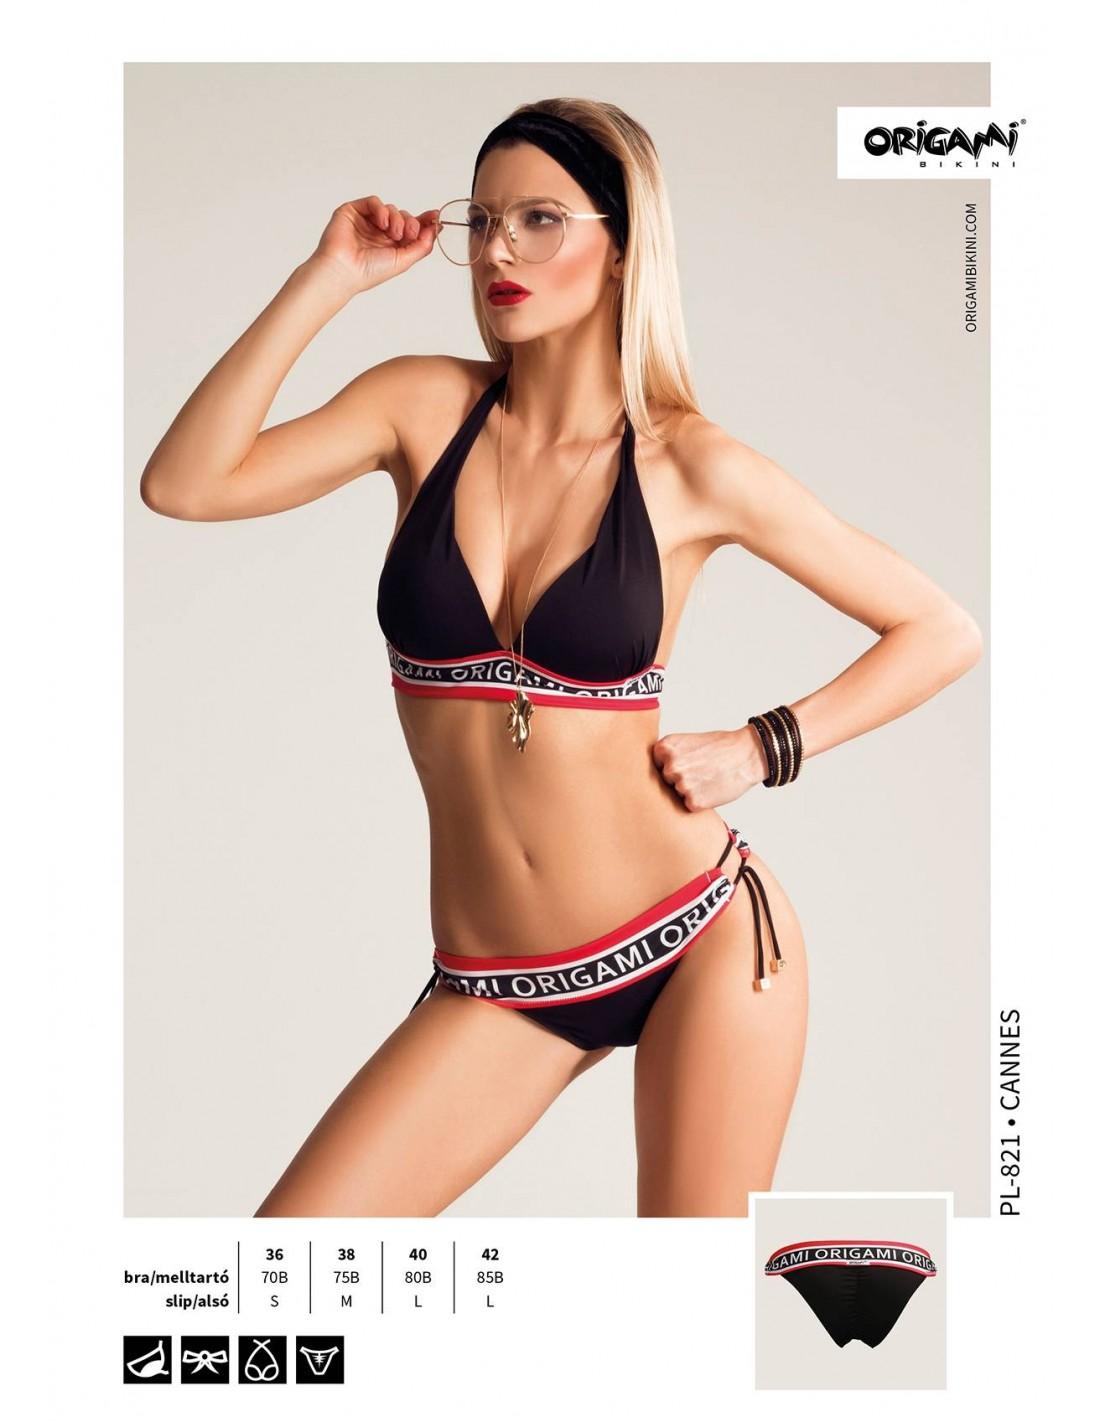 Origami Bikini Cannes PL-821 d08e60588a